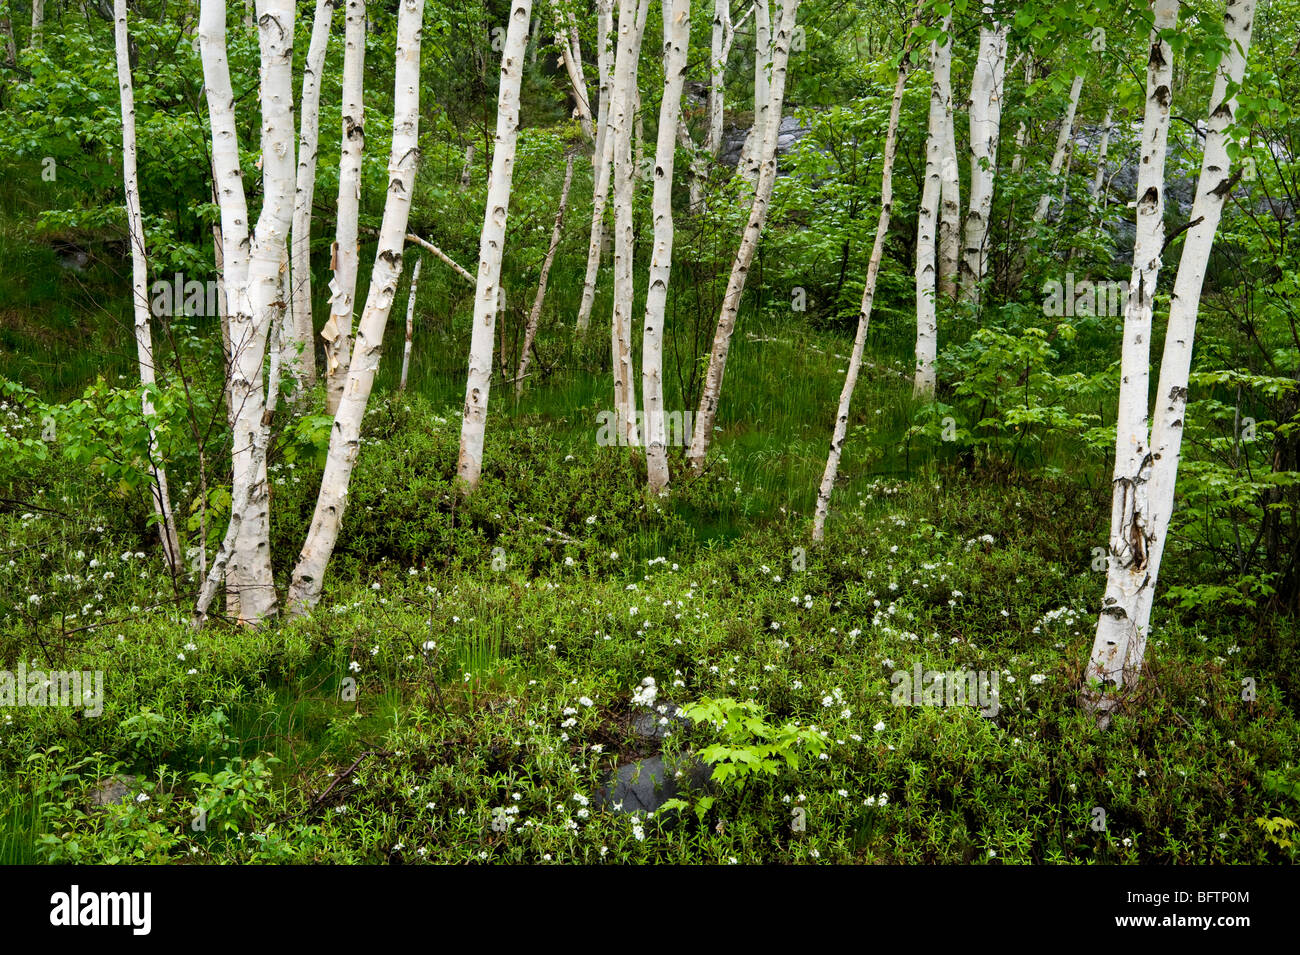 Grove of white birch trees and flowering Labrador tea in spring, Greater Sudbury, Ontario, Canada Stock Photo